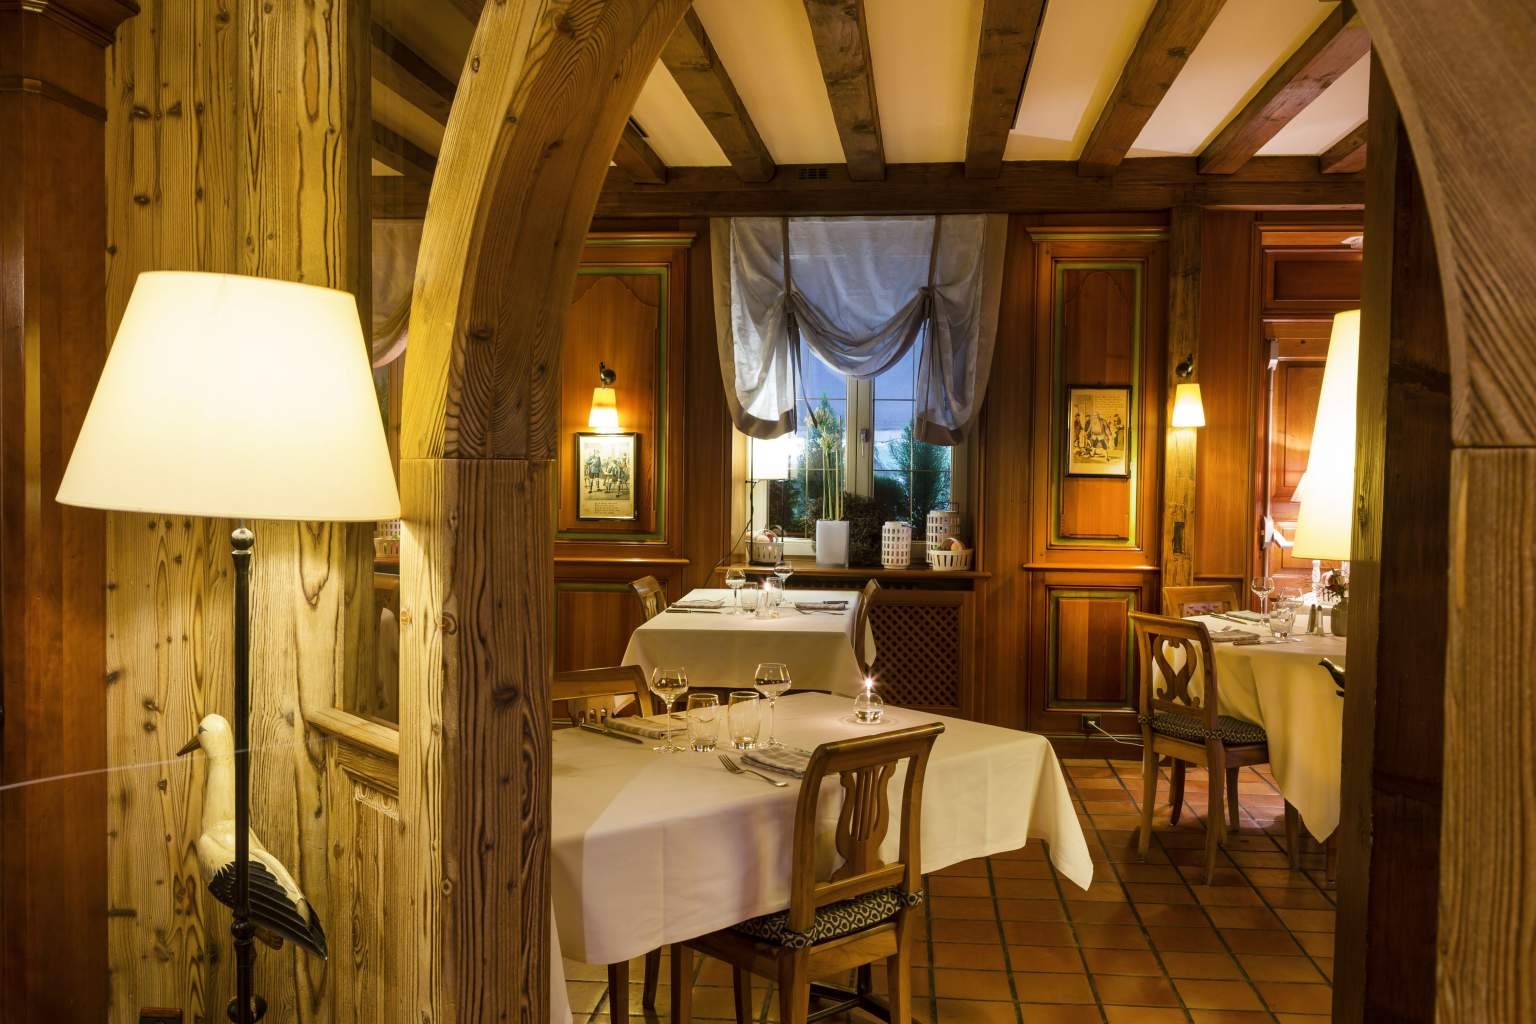 Winstub Rabseppi-Stebel Saint Hippolyte - Hôtel Le Parc à Saint Hippolyte - Restaurant à Saint Hippolyte